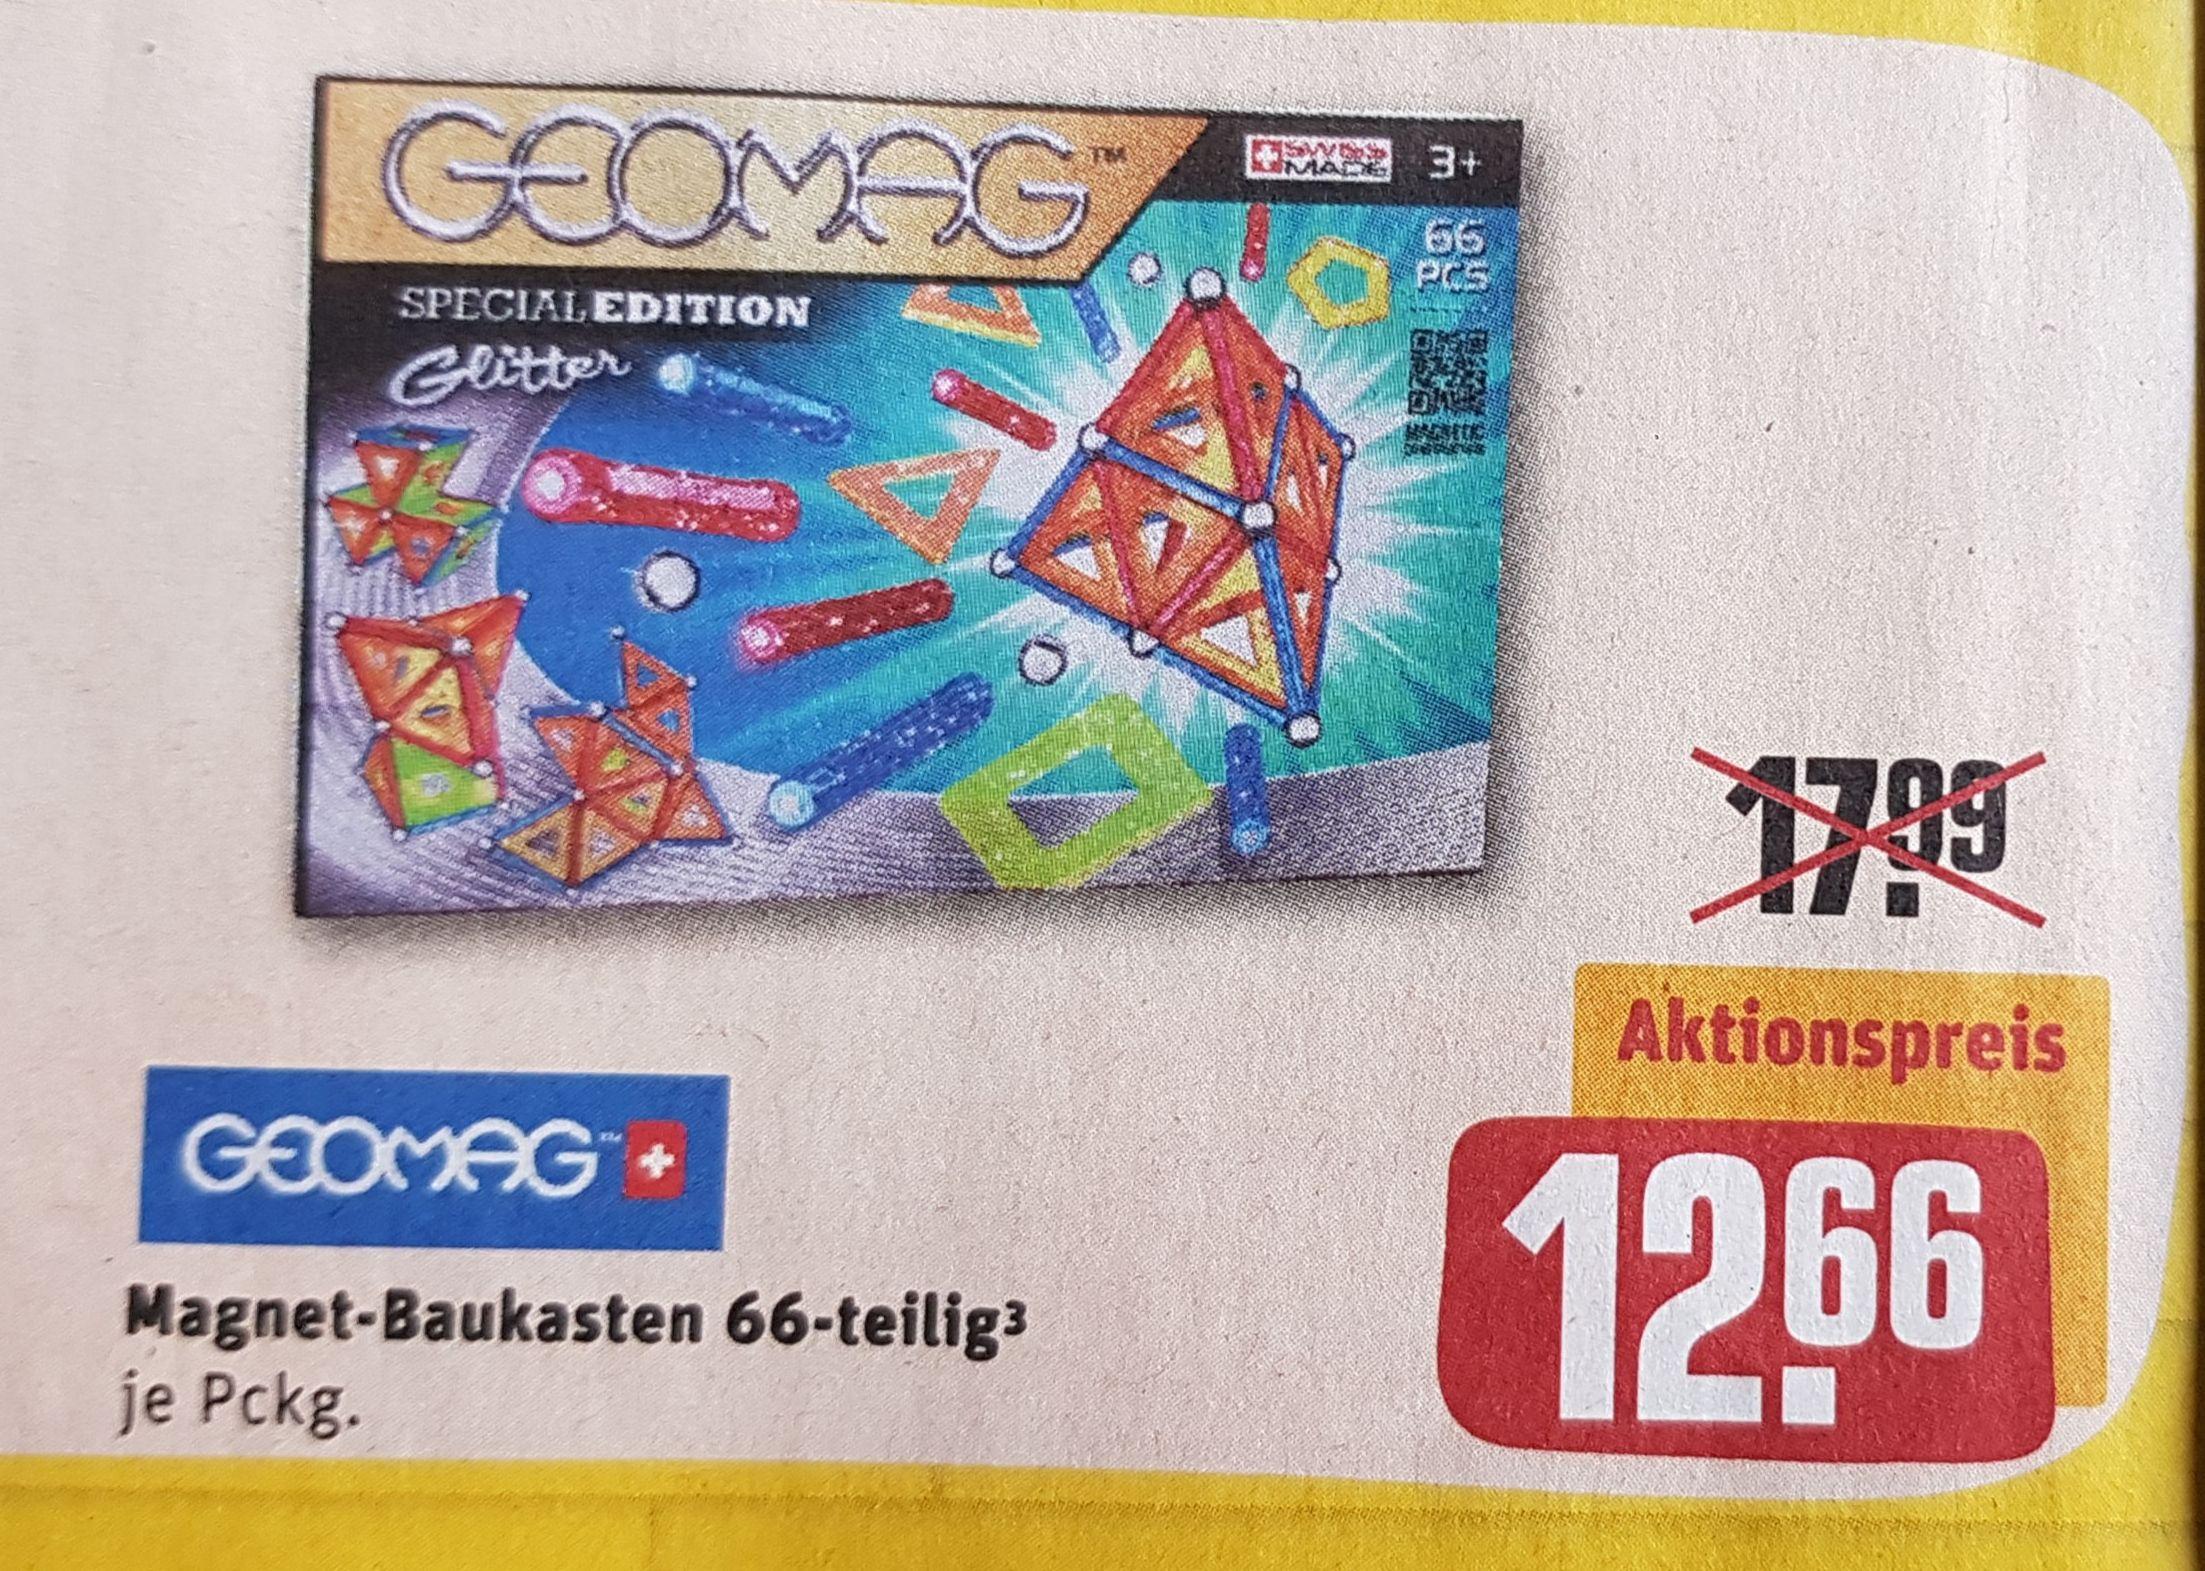 GEOMAG Special Edition Glitter, Magnet-Baukasten 66-teilig, rewe